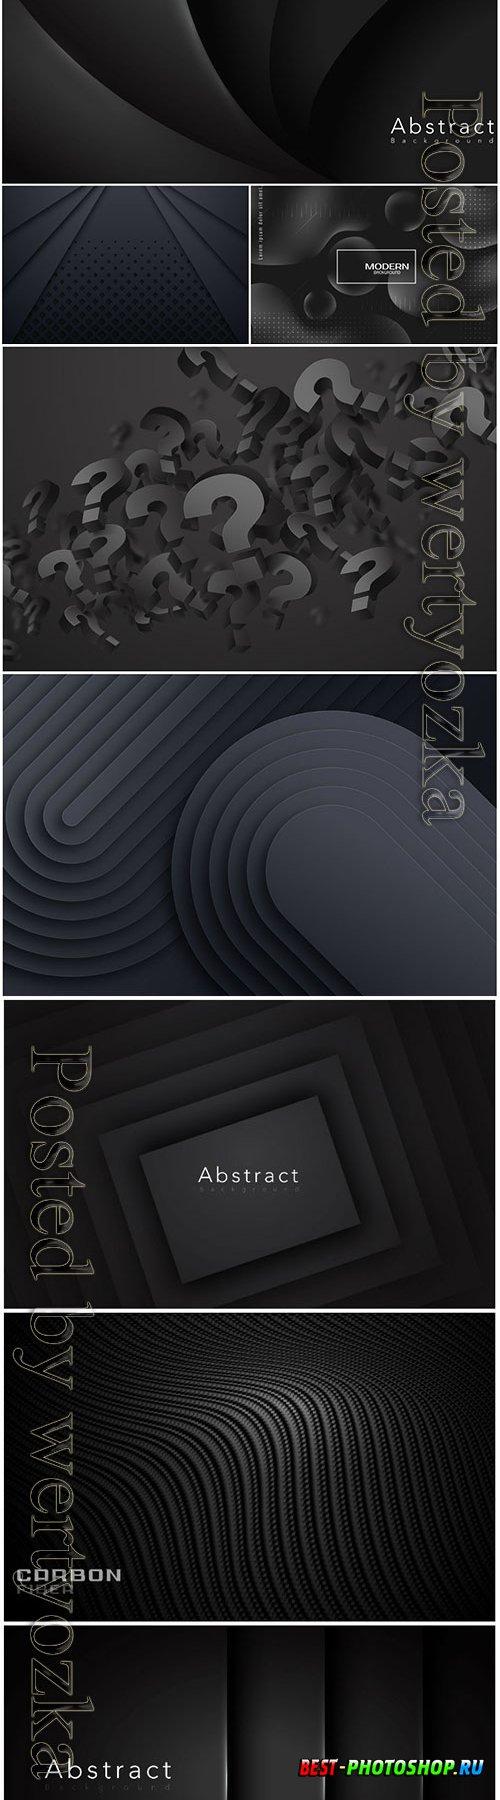 Dark vector abstract background